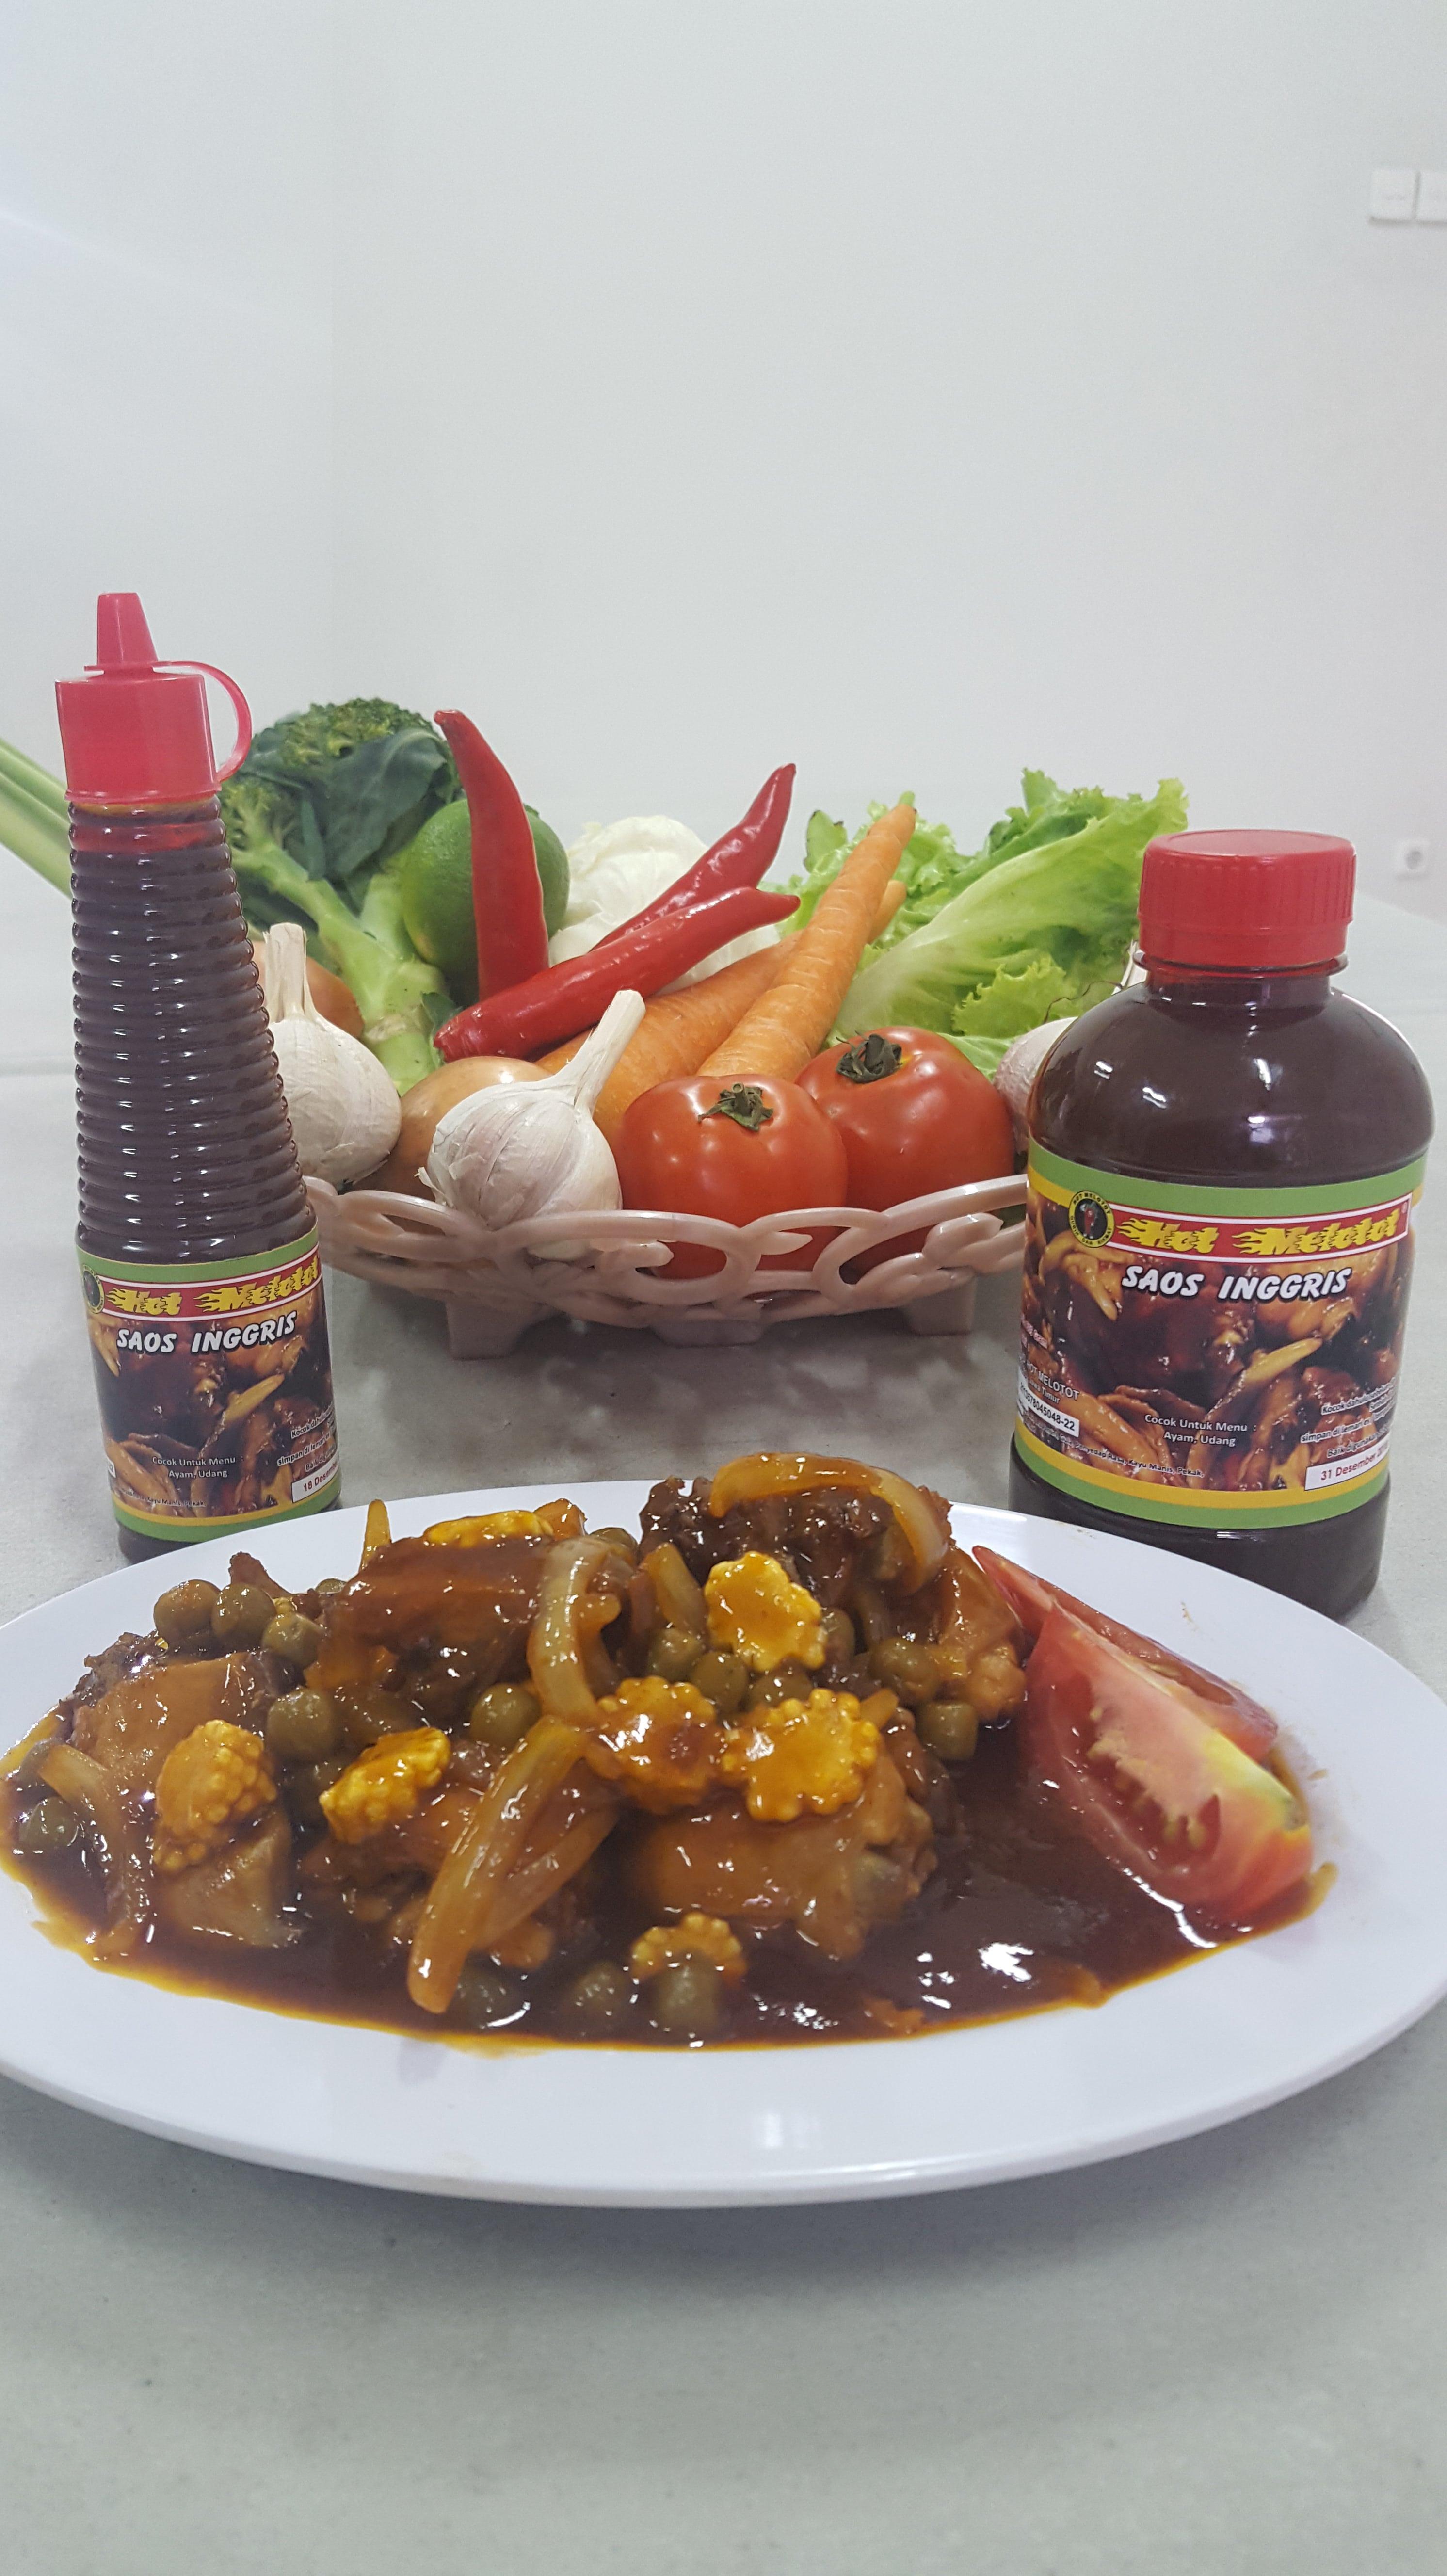 Jual Saus Distributor Beli Supplier Eksportir Importir Saos Cabe Extra Hot Oleh Khas Surabaya Bumbu Inggris Melotot Ukuran Kecil